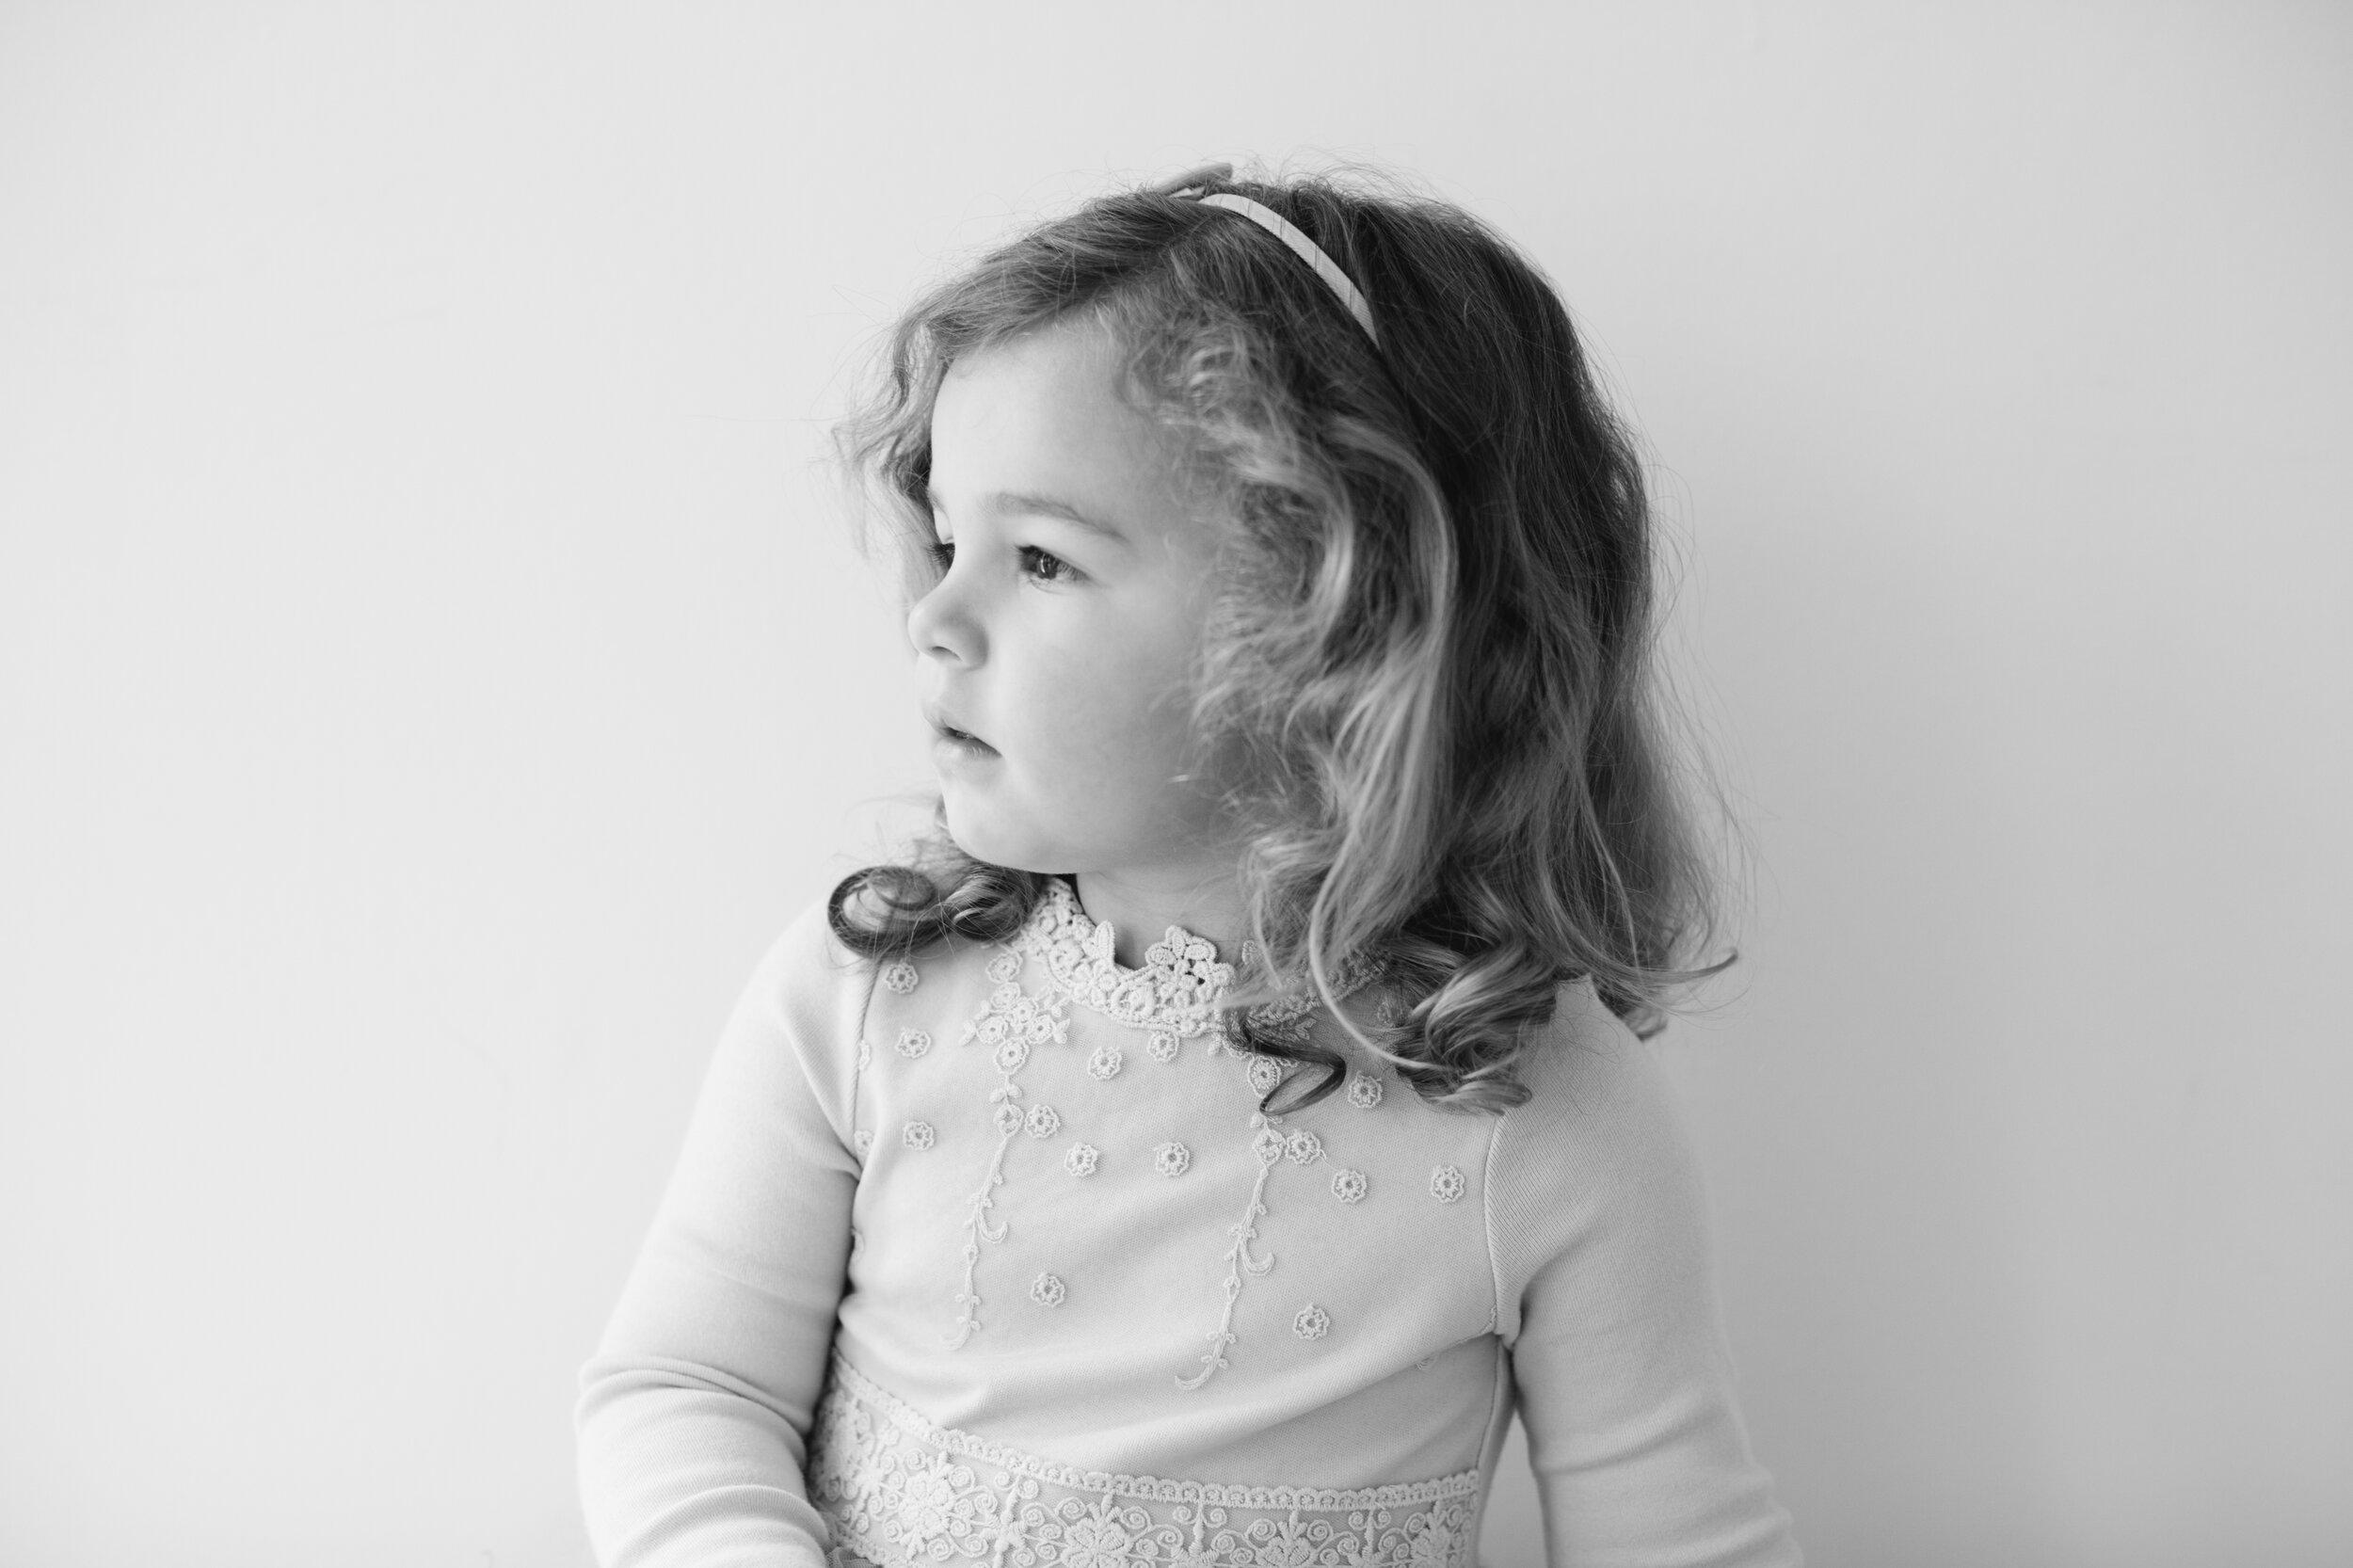 Penelope_&_Family_Studio_Abigail_Malone_Photography-12.jpg